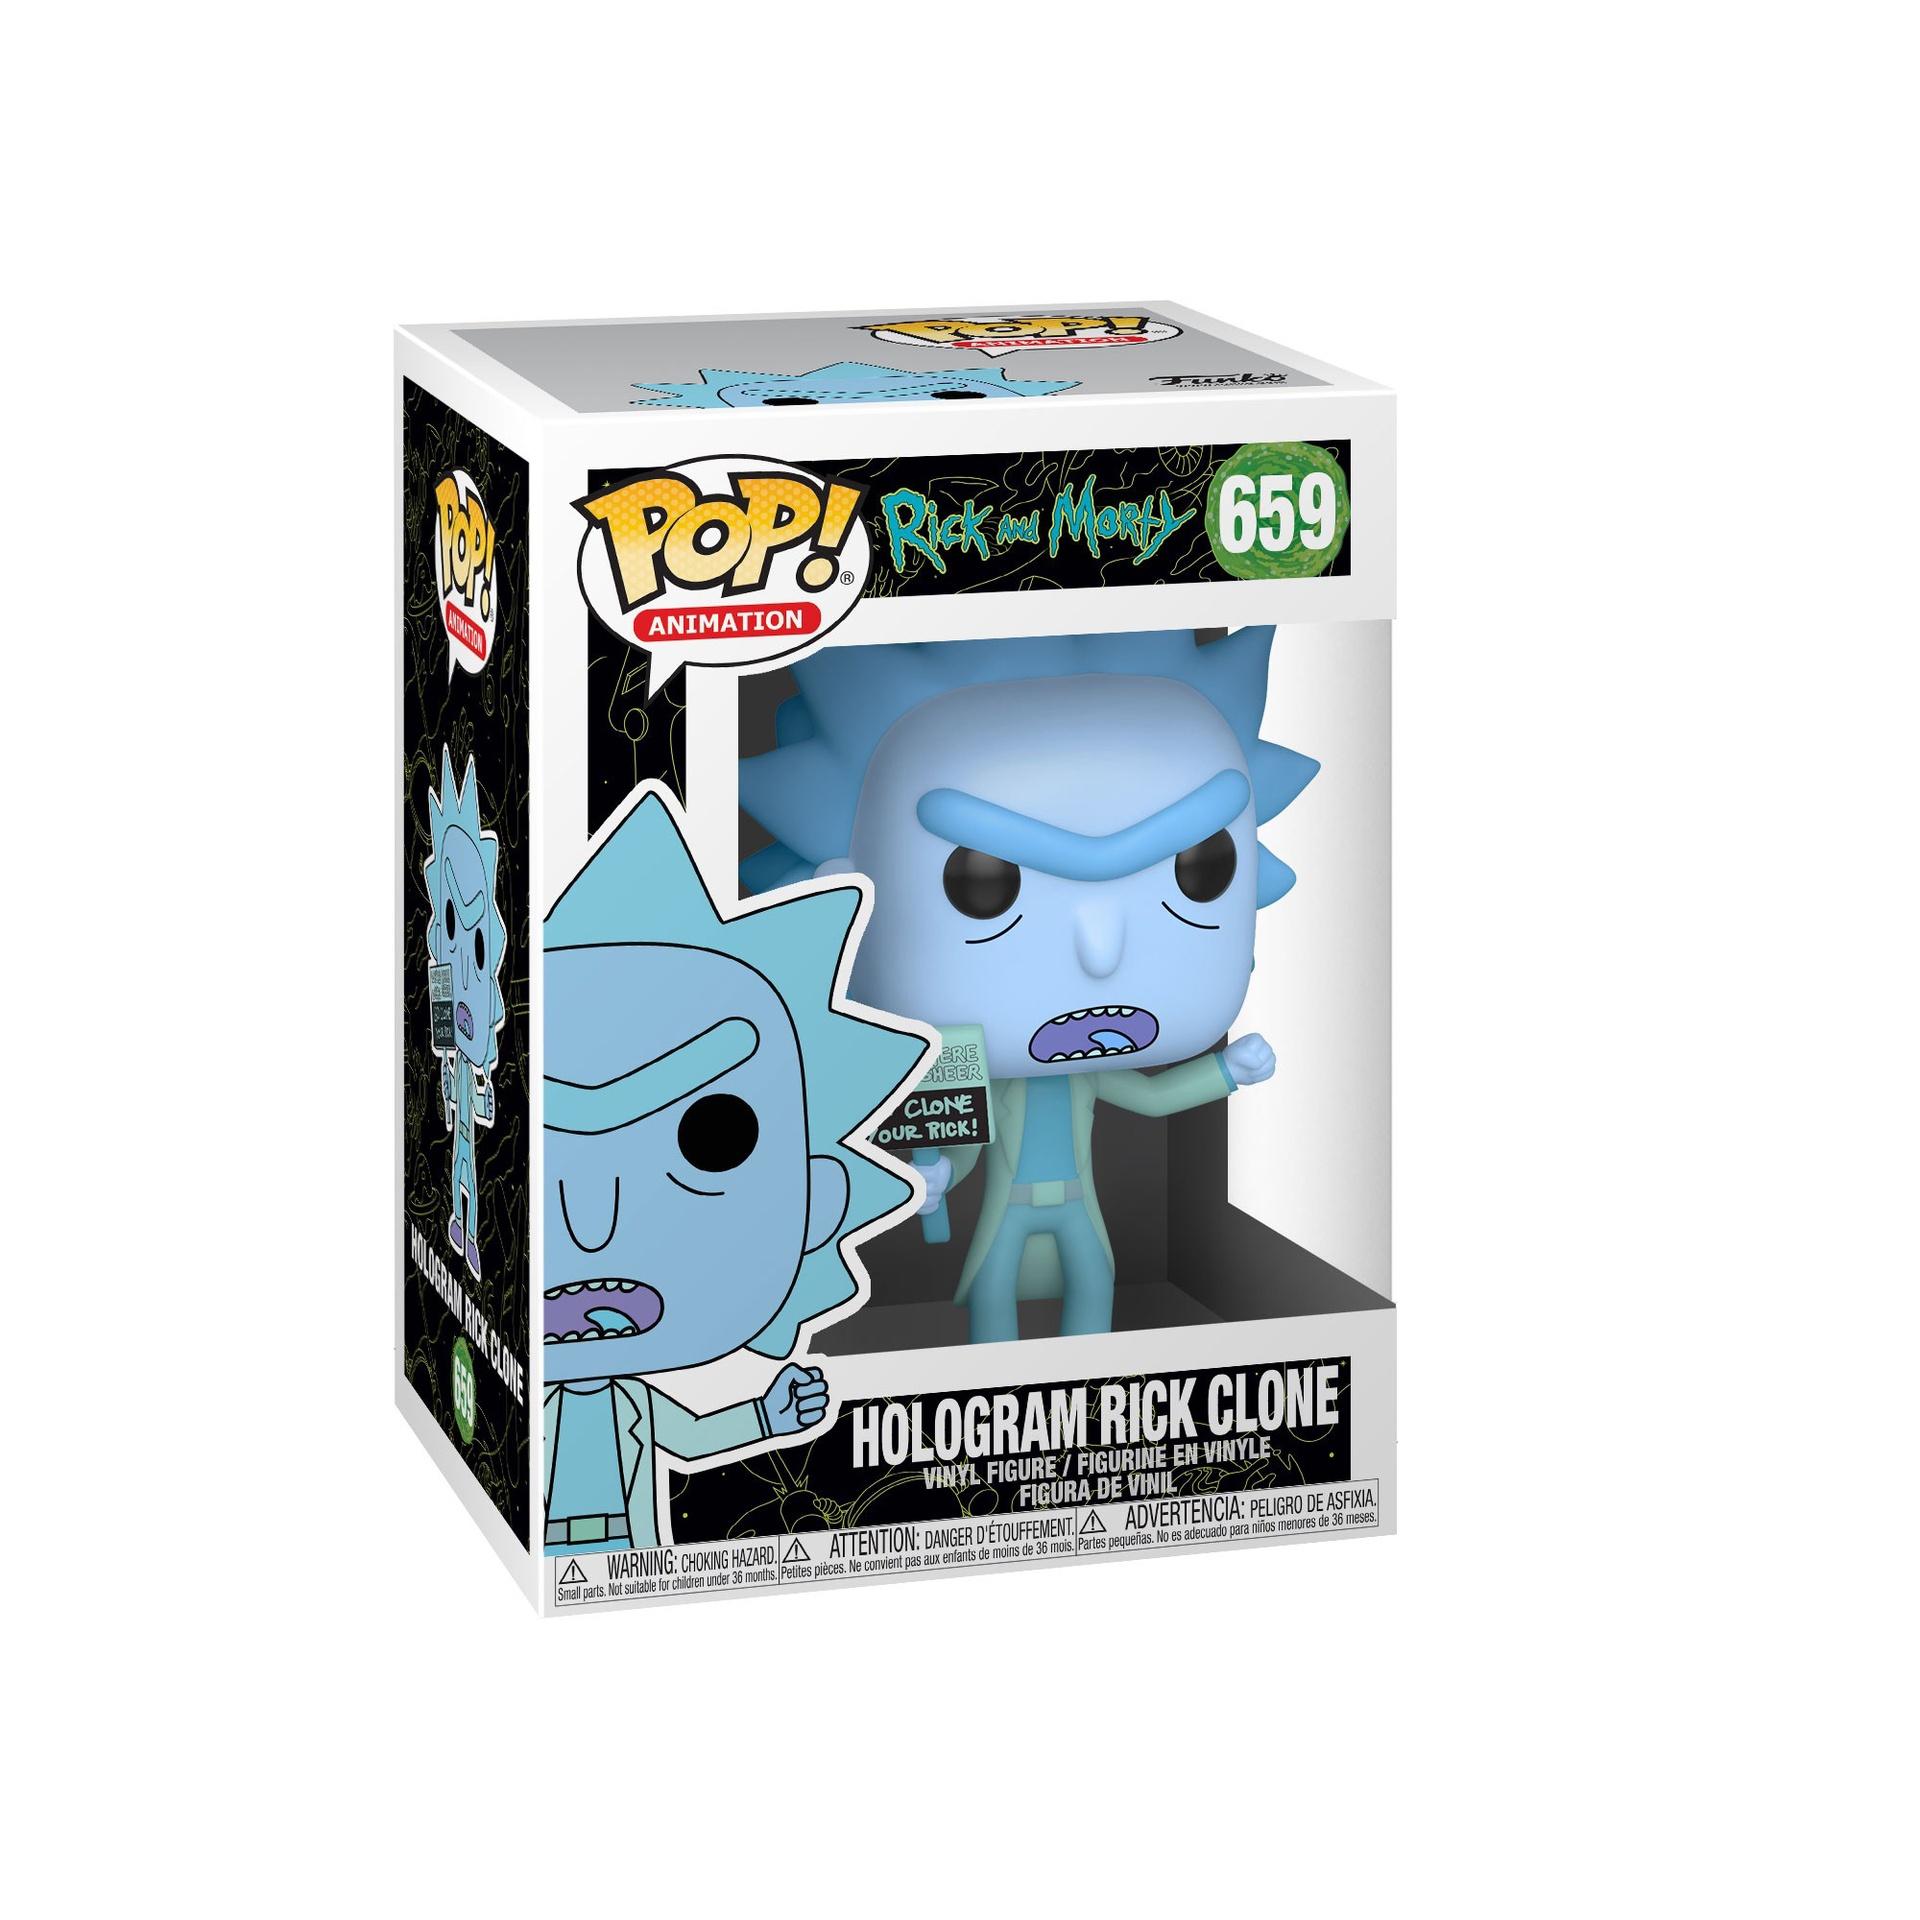 Rick and Morty – Hologram Rick Clone Pop! Vinyl Figure